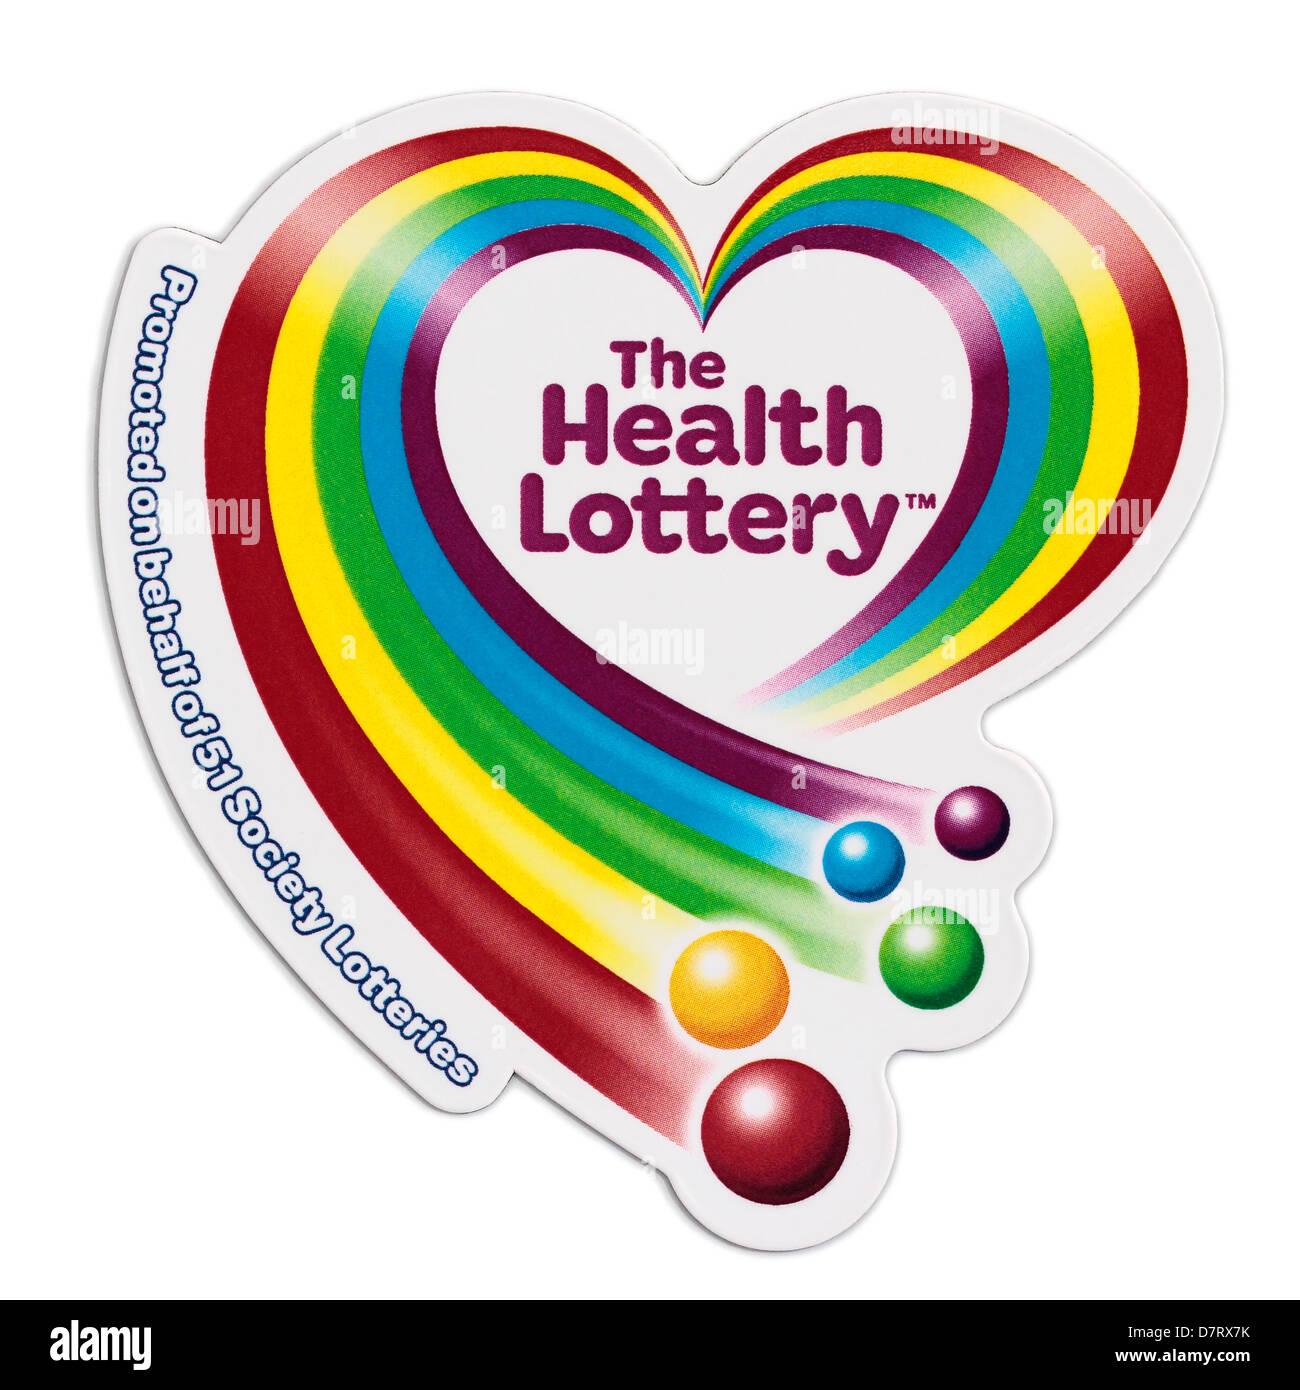 The Health Lottery Fridge Magnet Stock Photo